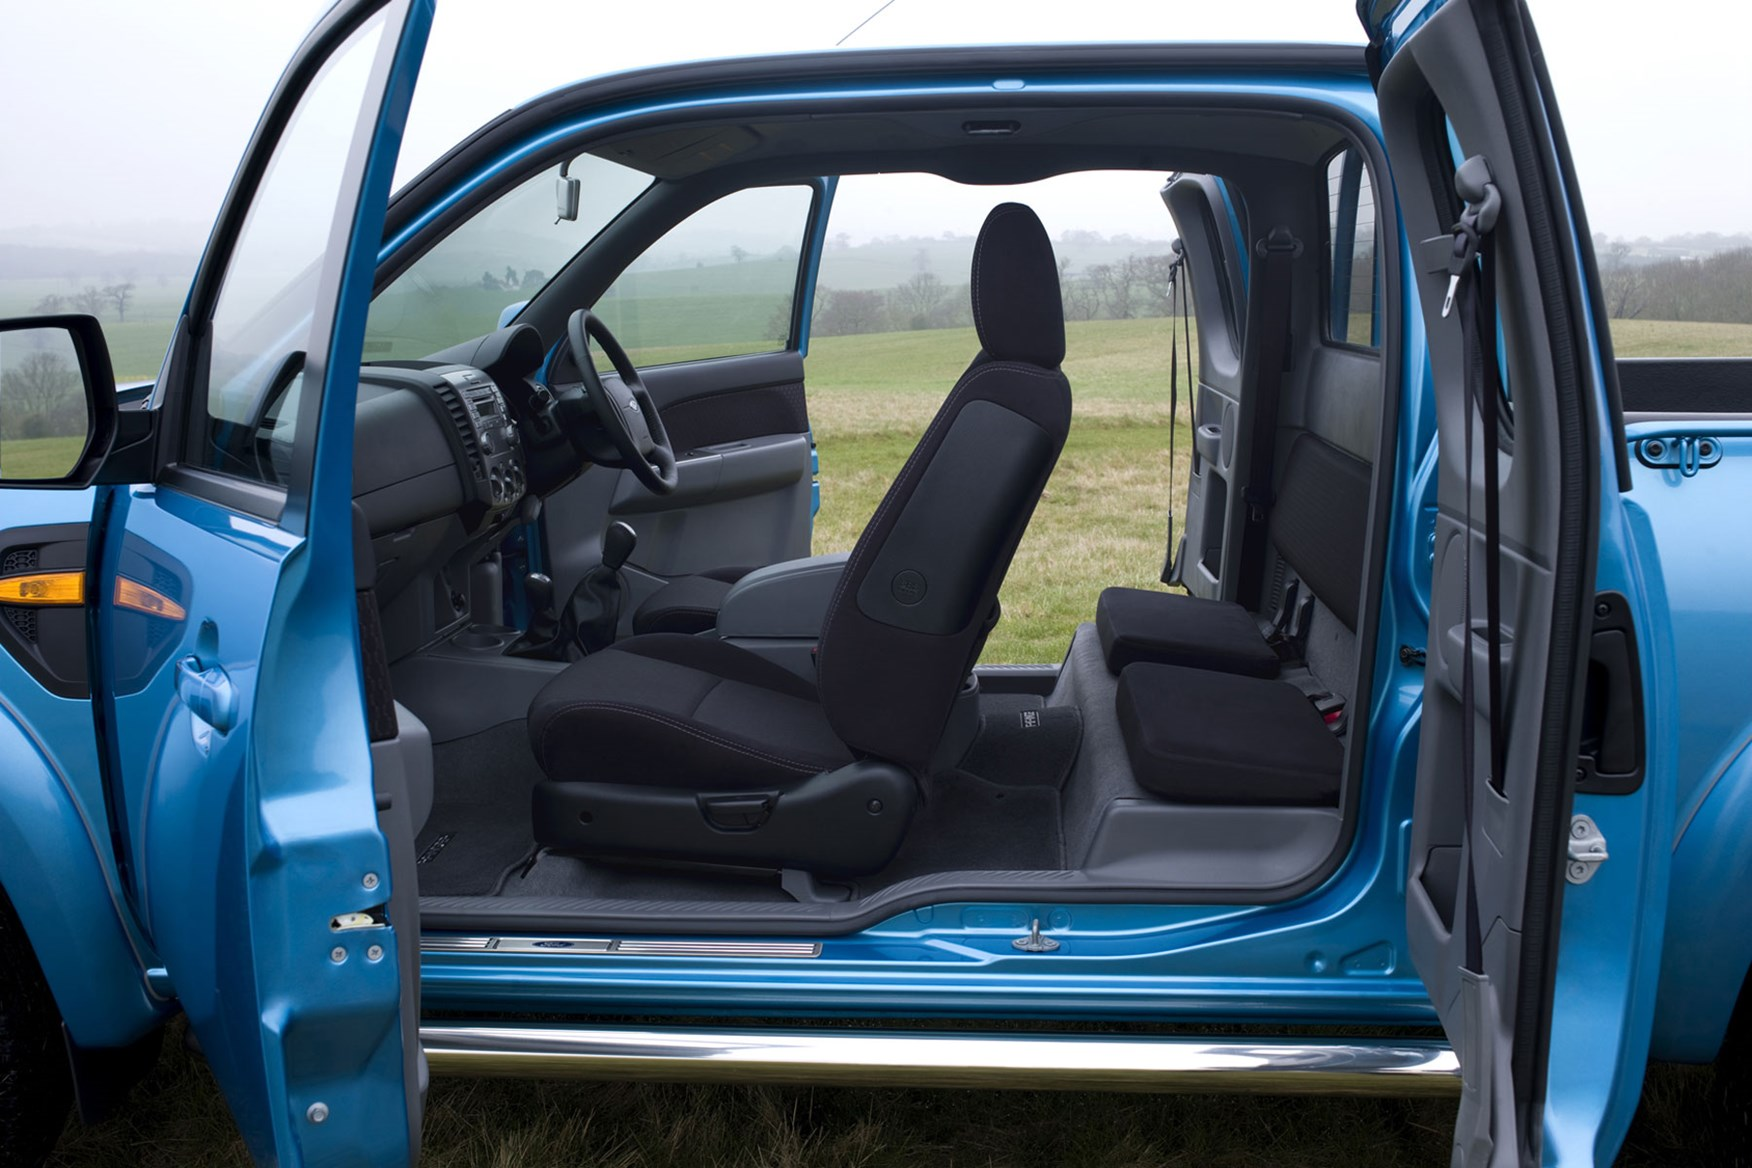 Ford Ranger (2006-2011) Super Cab door opening